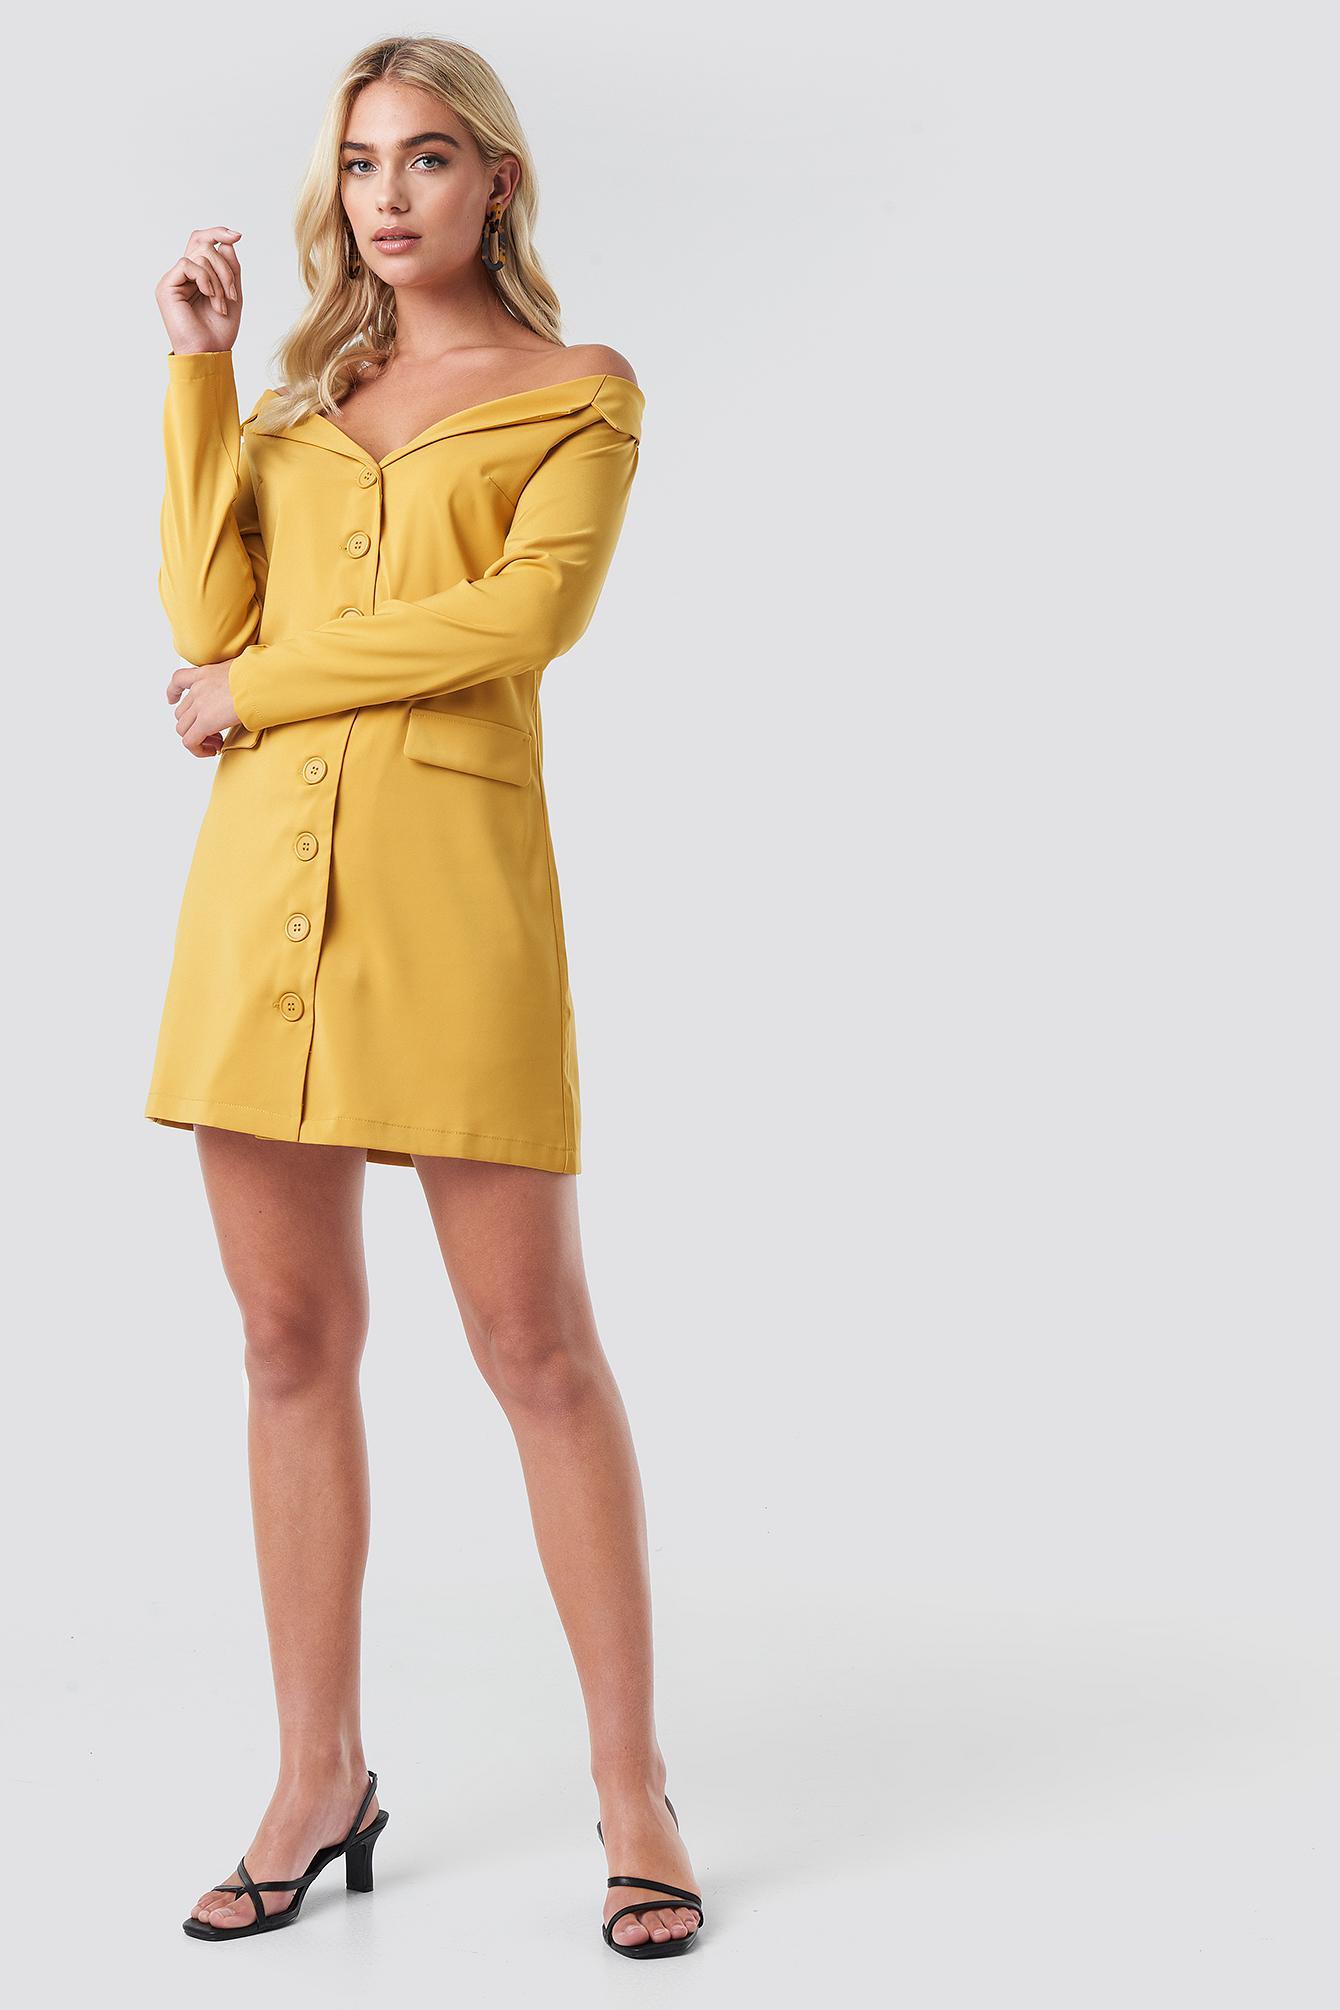 5fe41eb88297 NA-KD - Off Shoulder Blazer Dress Mustard Yellow - Lyst. View fullscreen